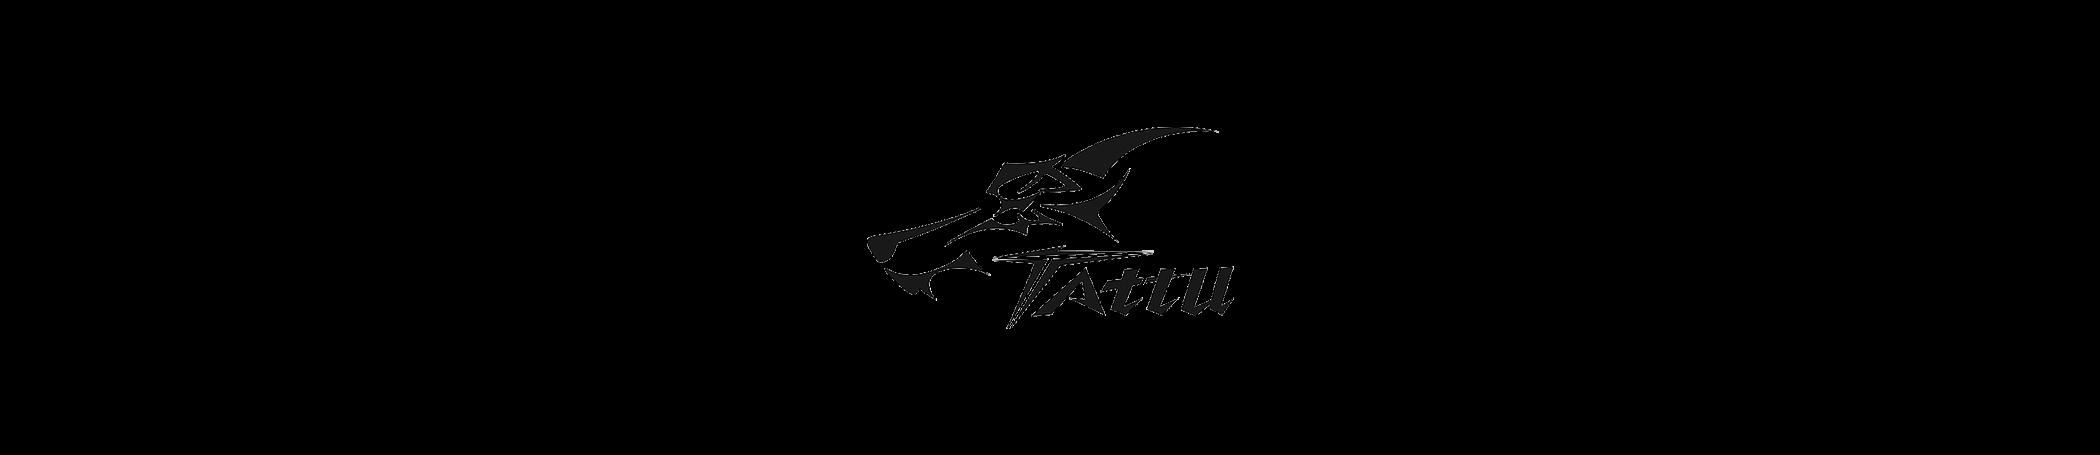 tattu fpv banner promotion shop description mantisfpv